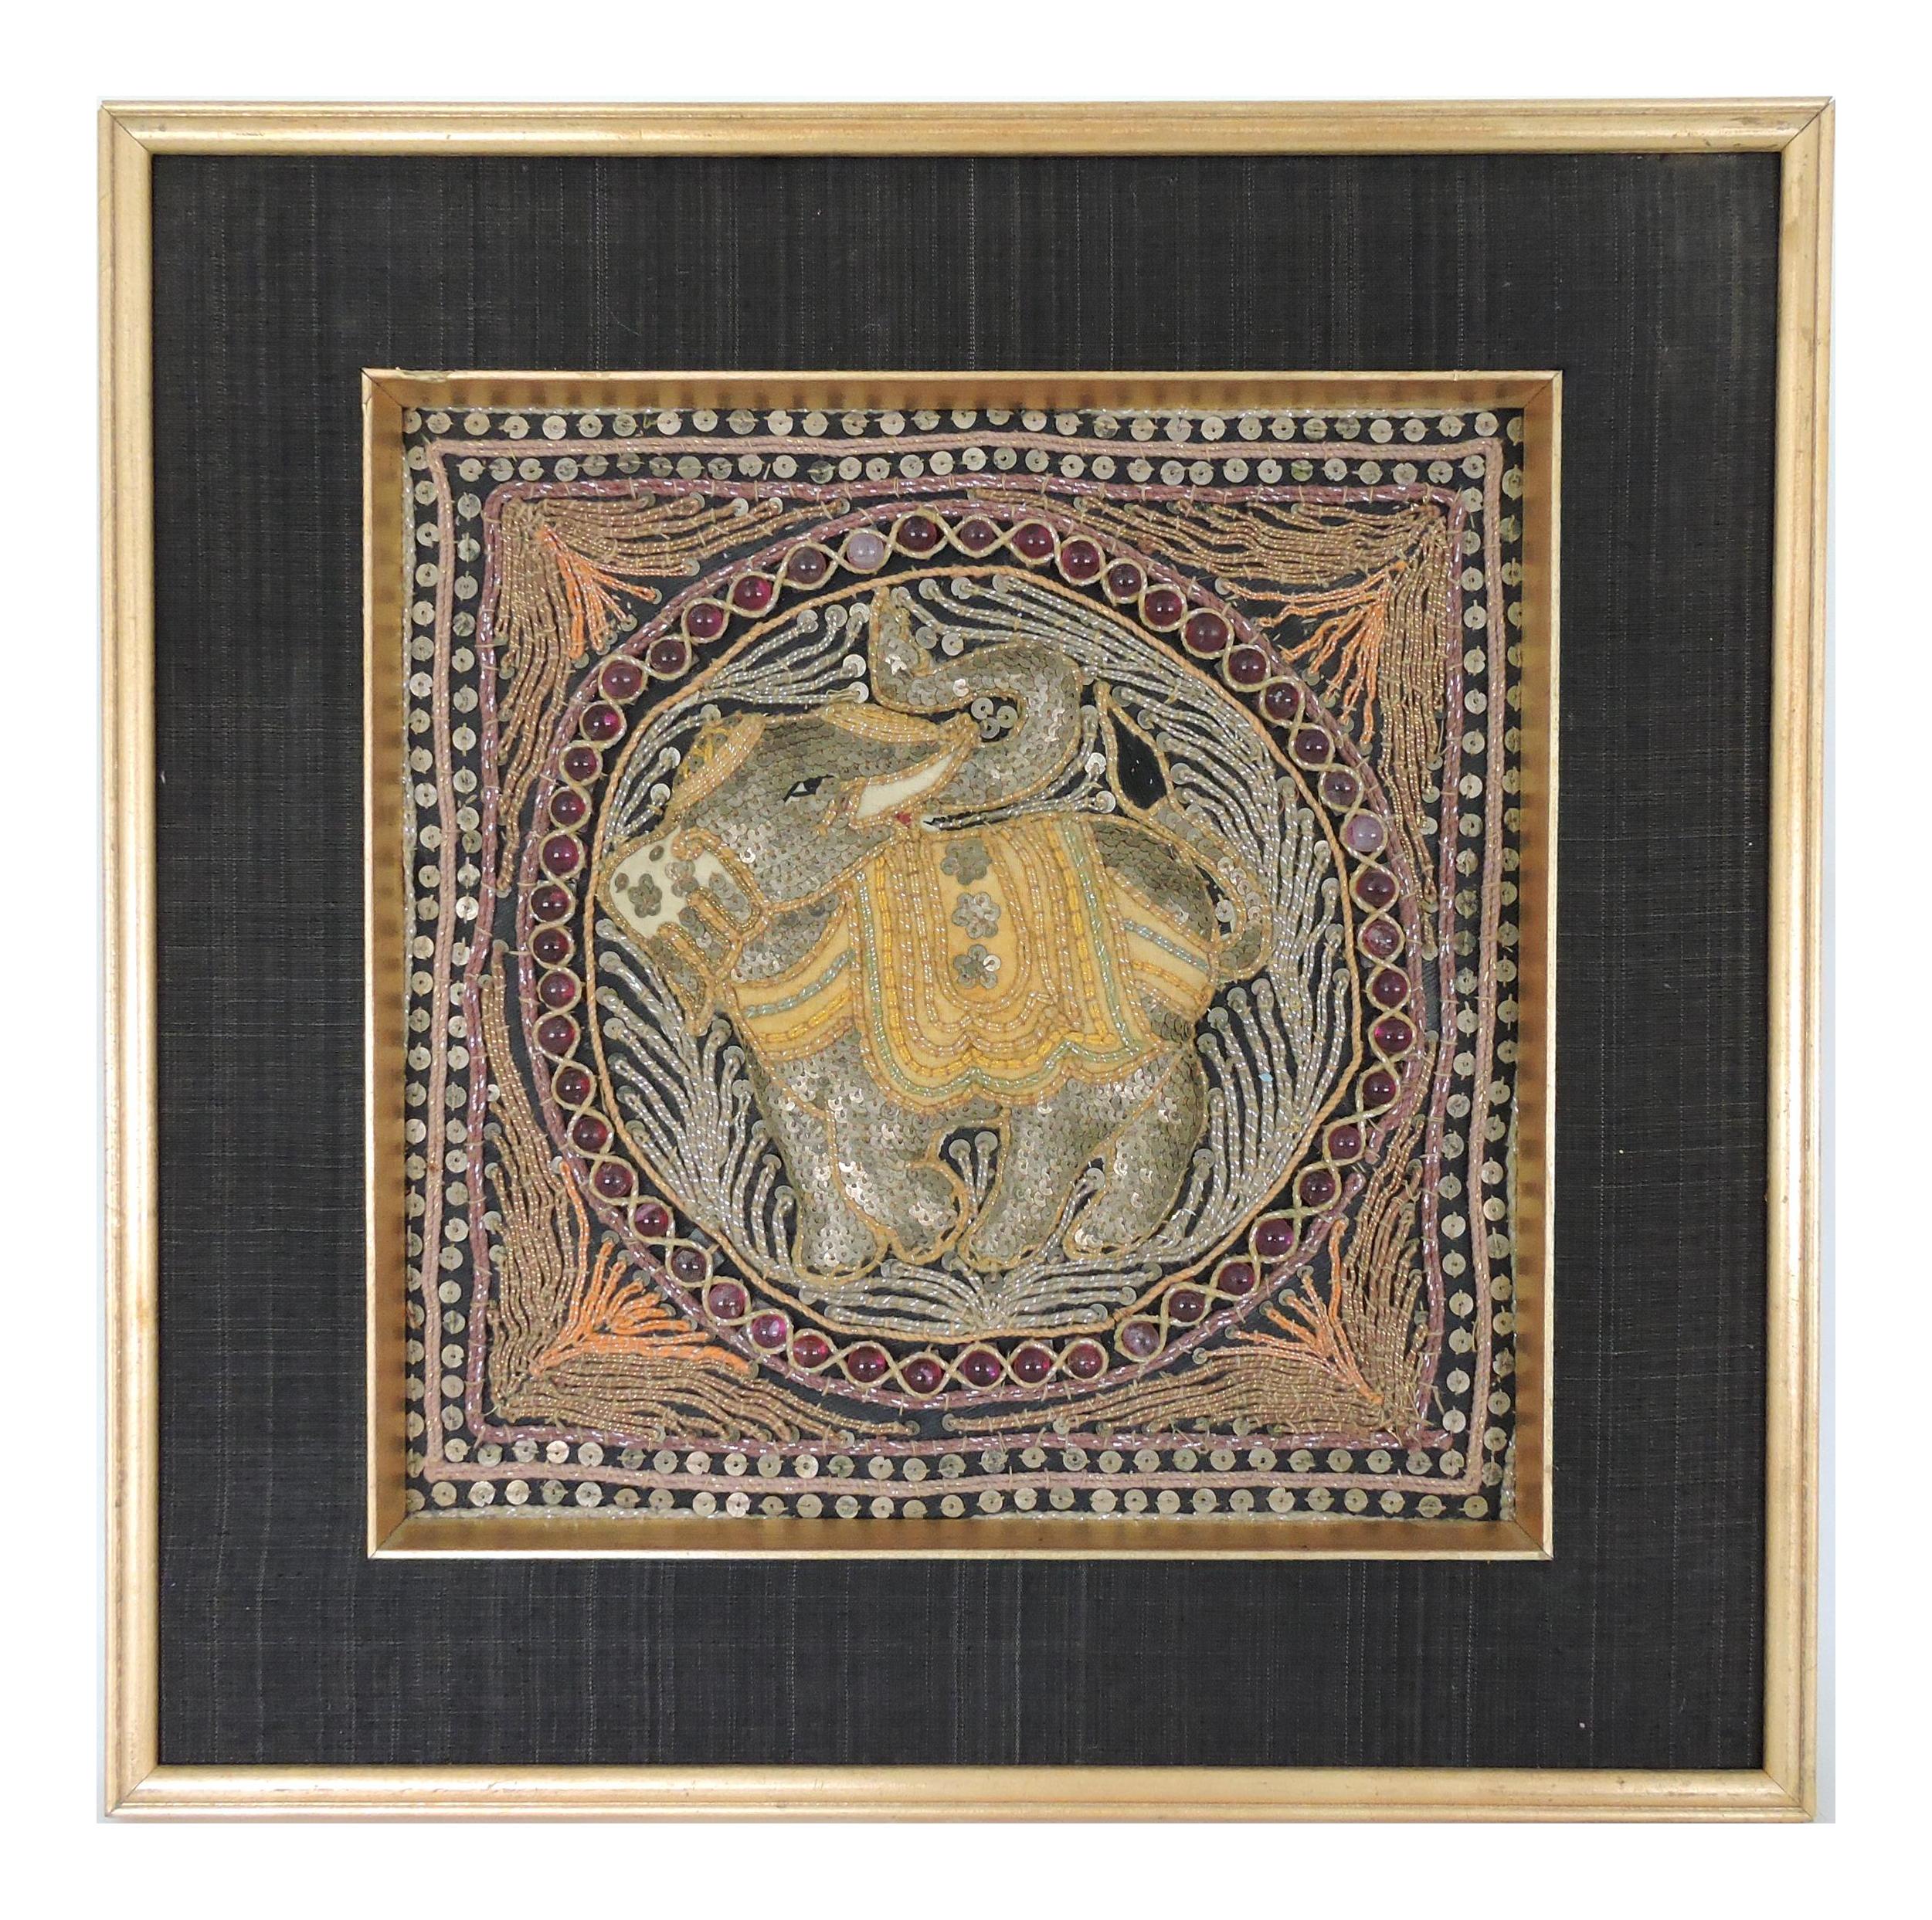 Embroidered Tapestry Framed Vintage Tapestry Hand-Sewn  Tapestry with Golden Frame Tapestry Wall Decoration,